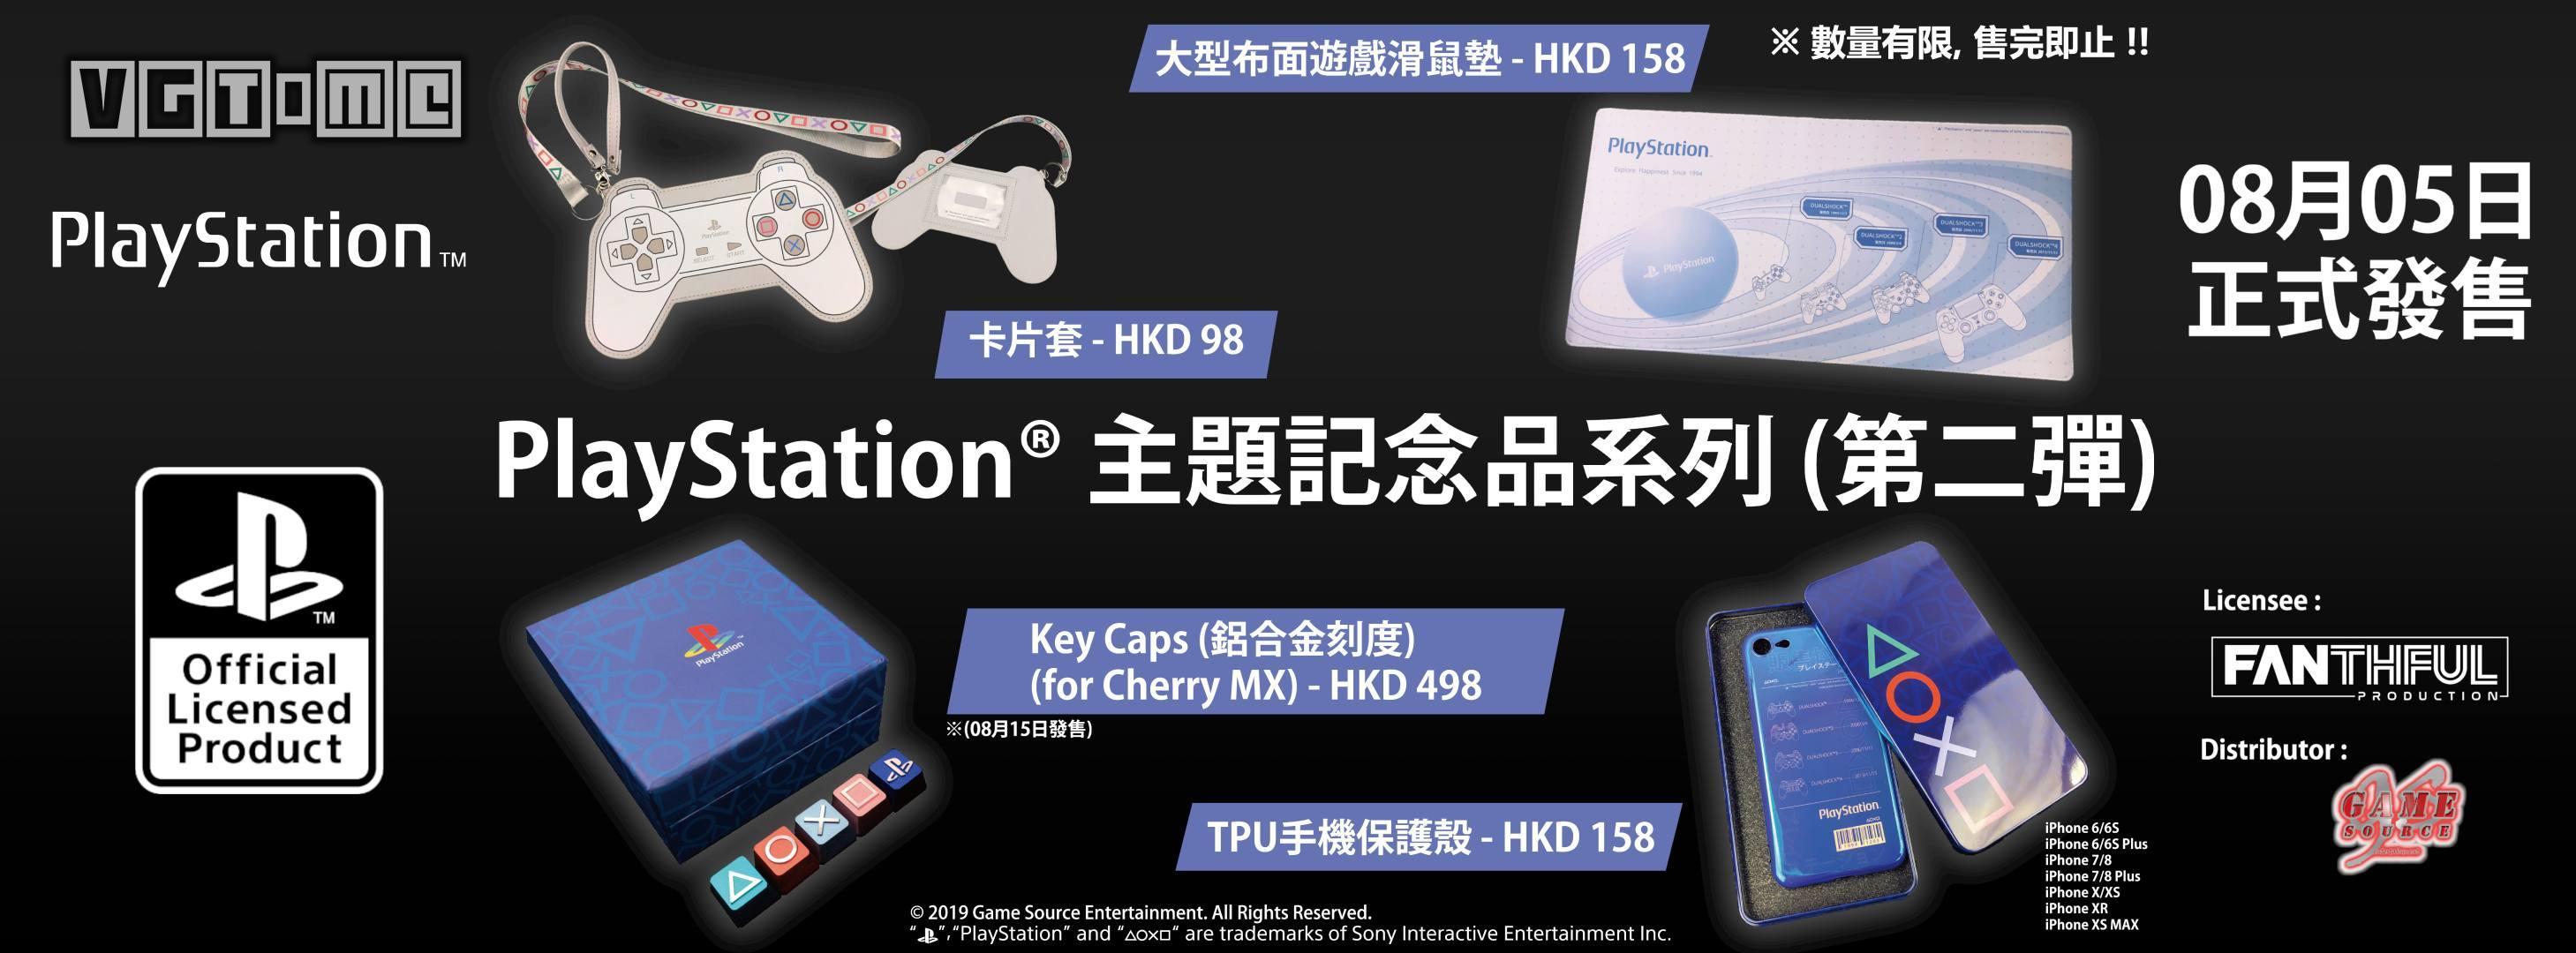 PlayStation主题纪念品第二弹公布 ?#21482;?#22771;鼠标垫应有尽有